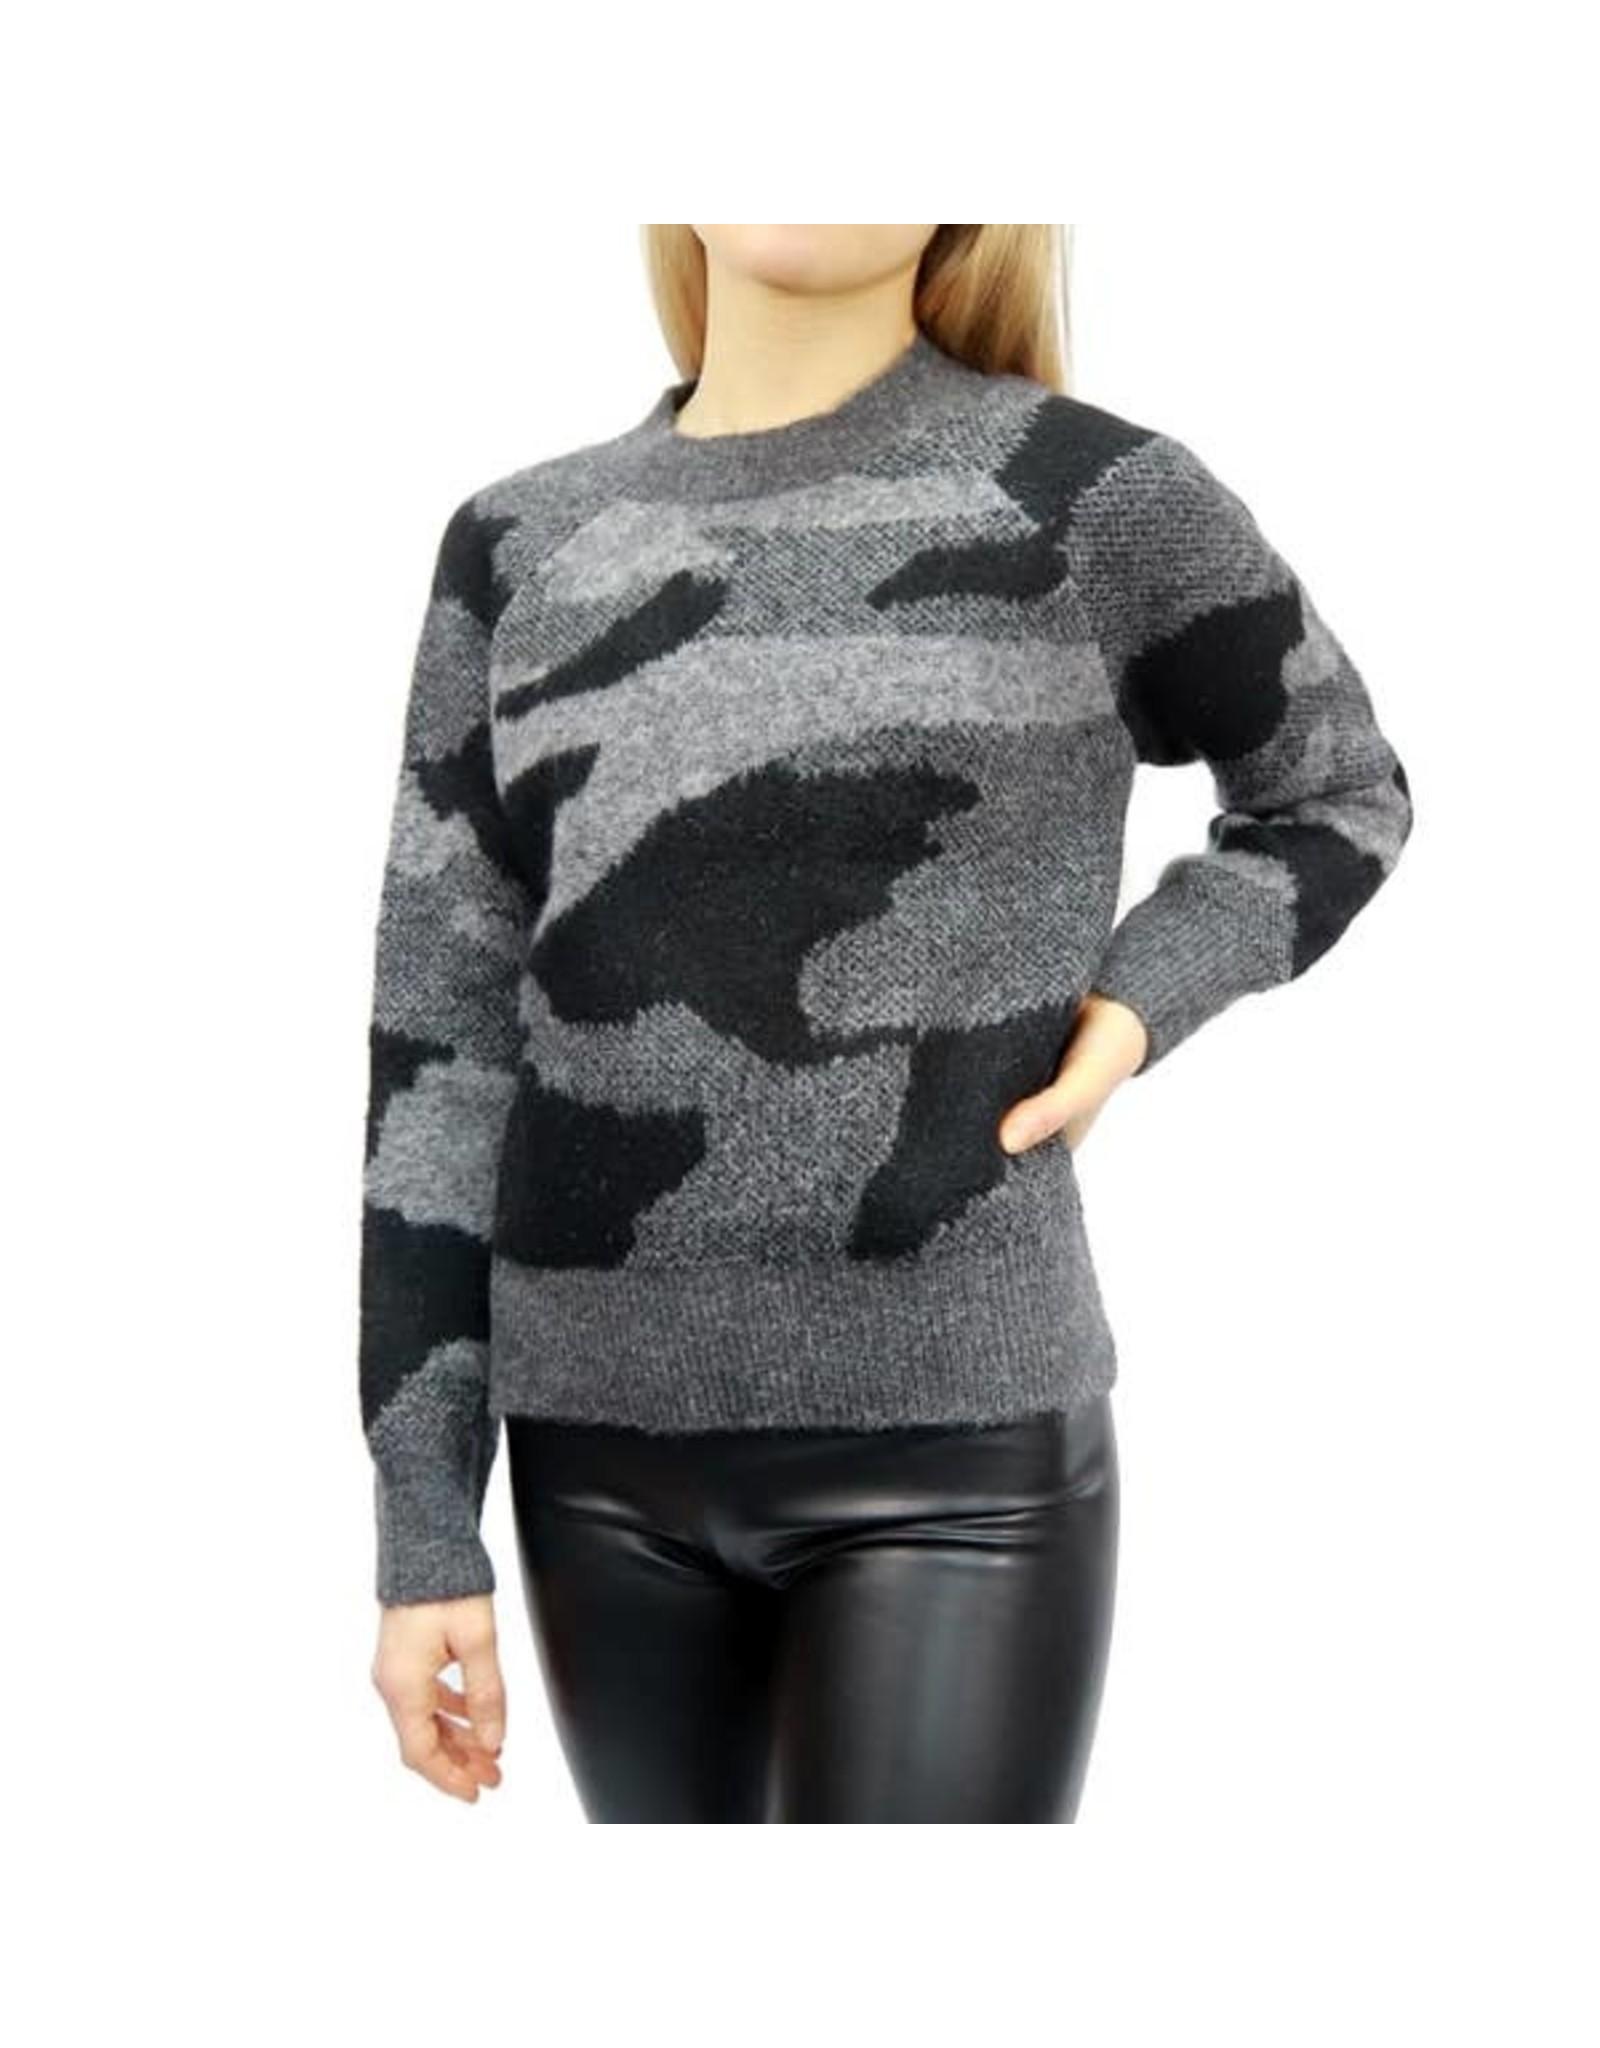 RD Style - Camo Crew Sweater